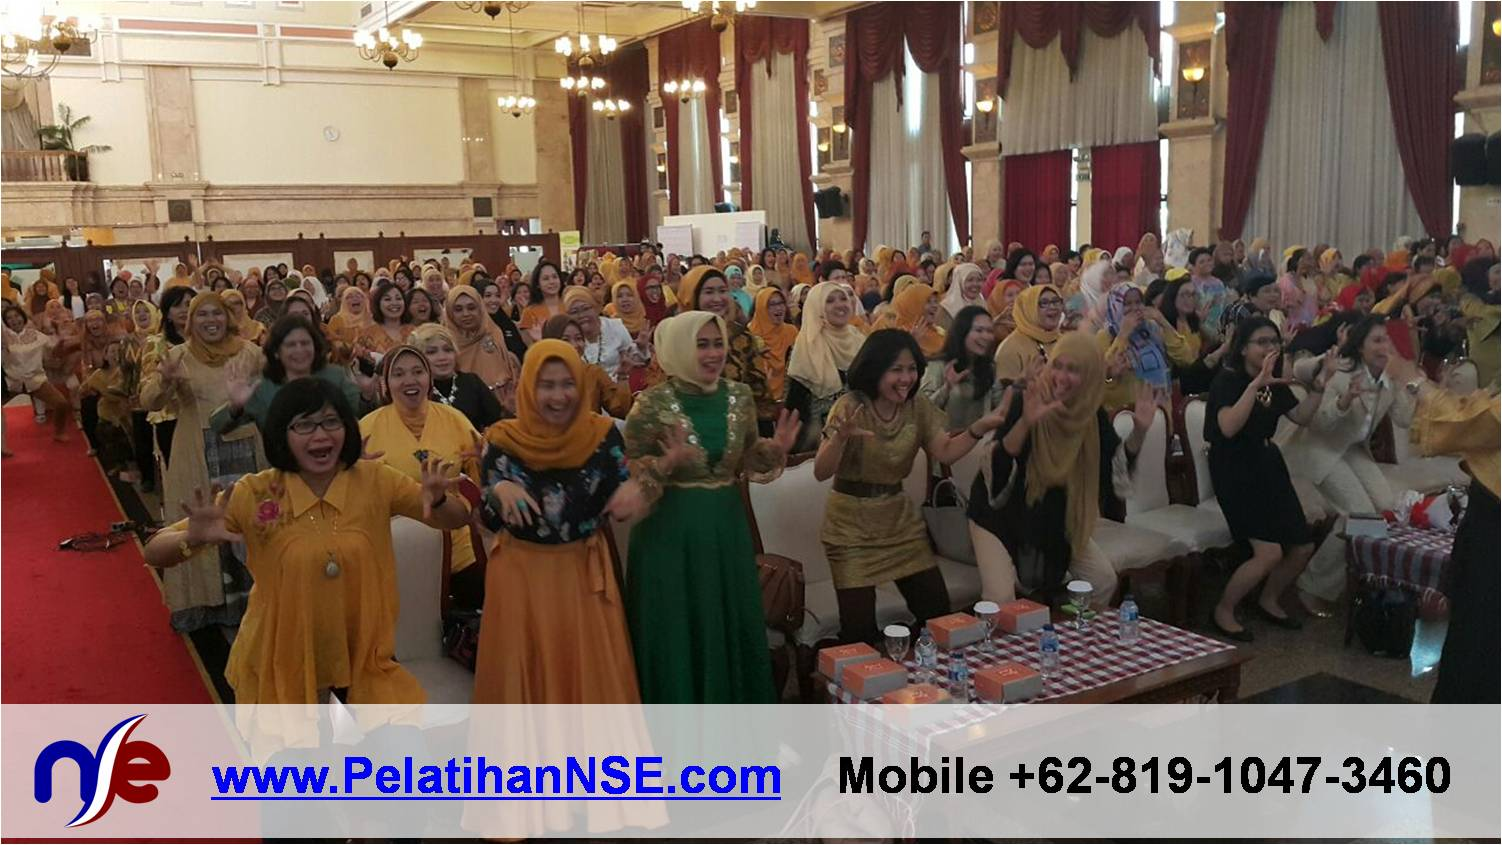 Yoga Tawa - Nova Inspiring Day 29 April 2015 - 1000 peserta melakukan Tawa Singa.png